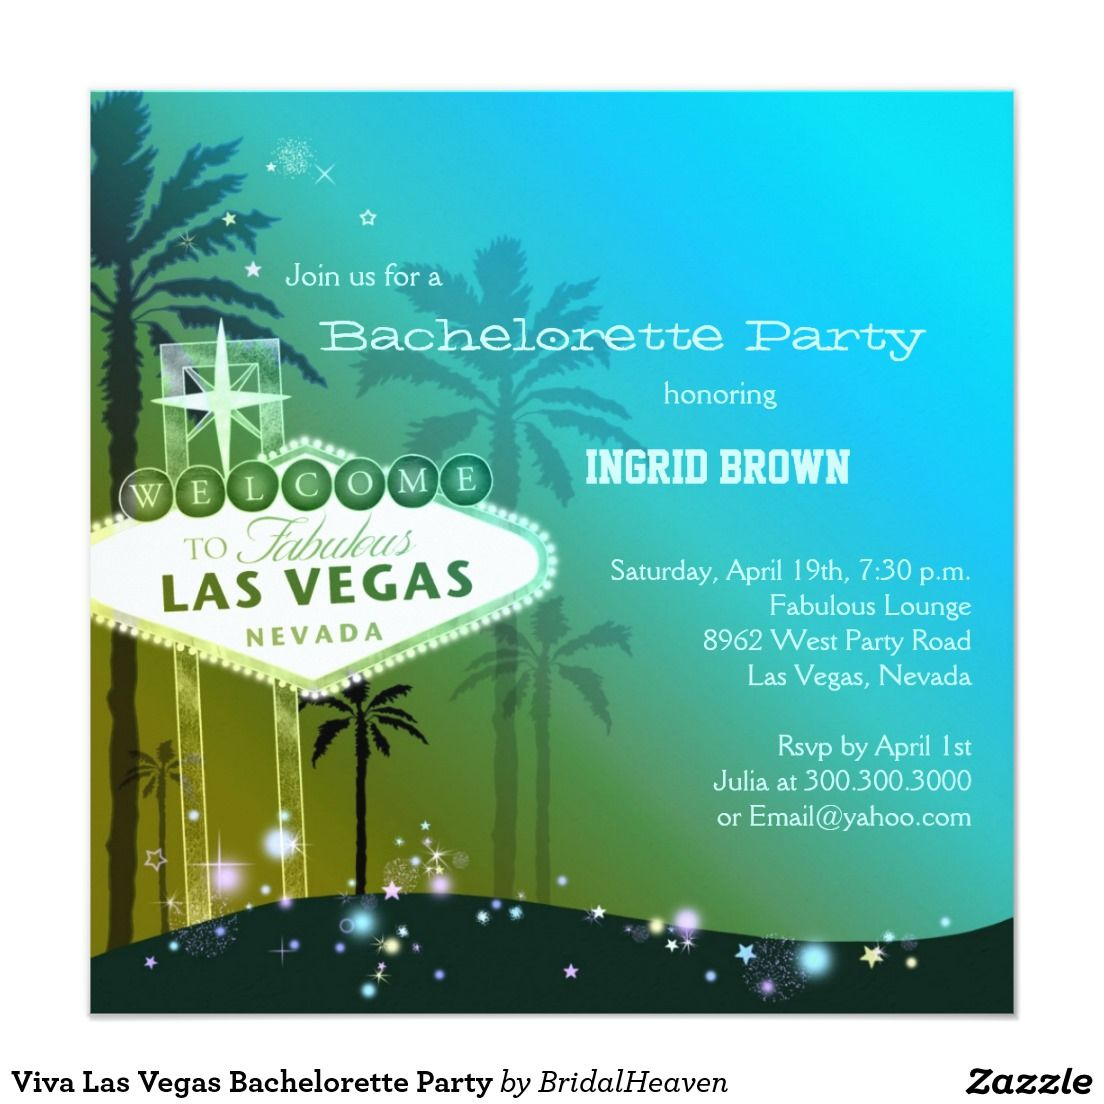 Viva Las Vegas Bachelorette Party | Bachelorette Party Invitations ...